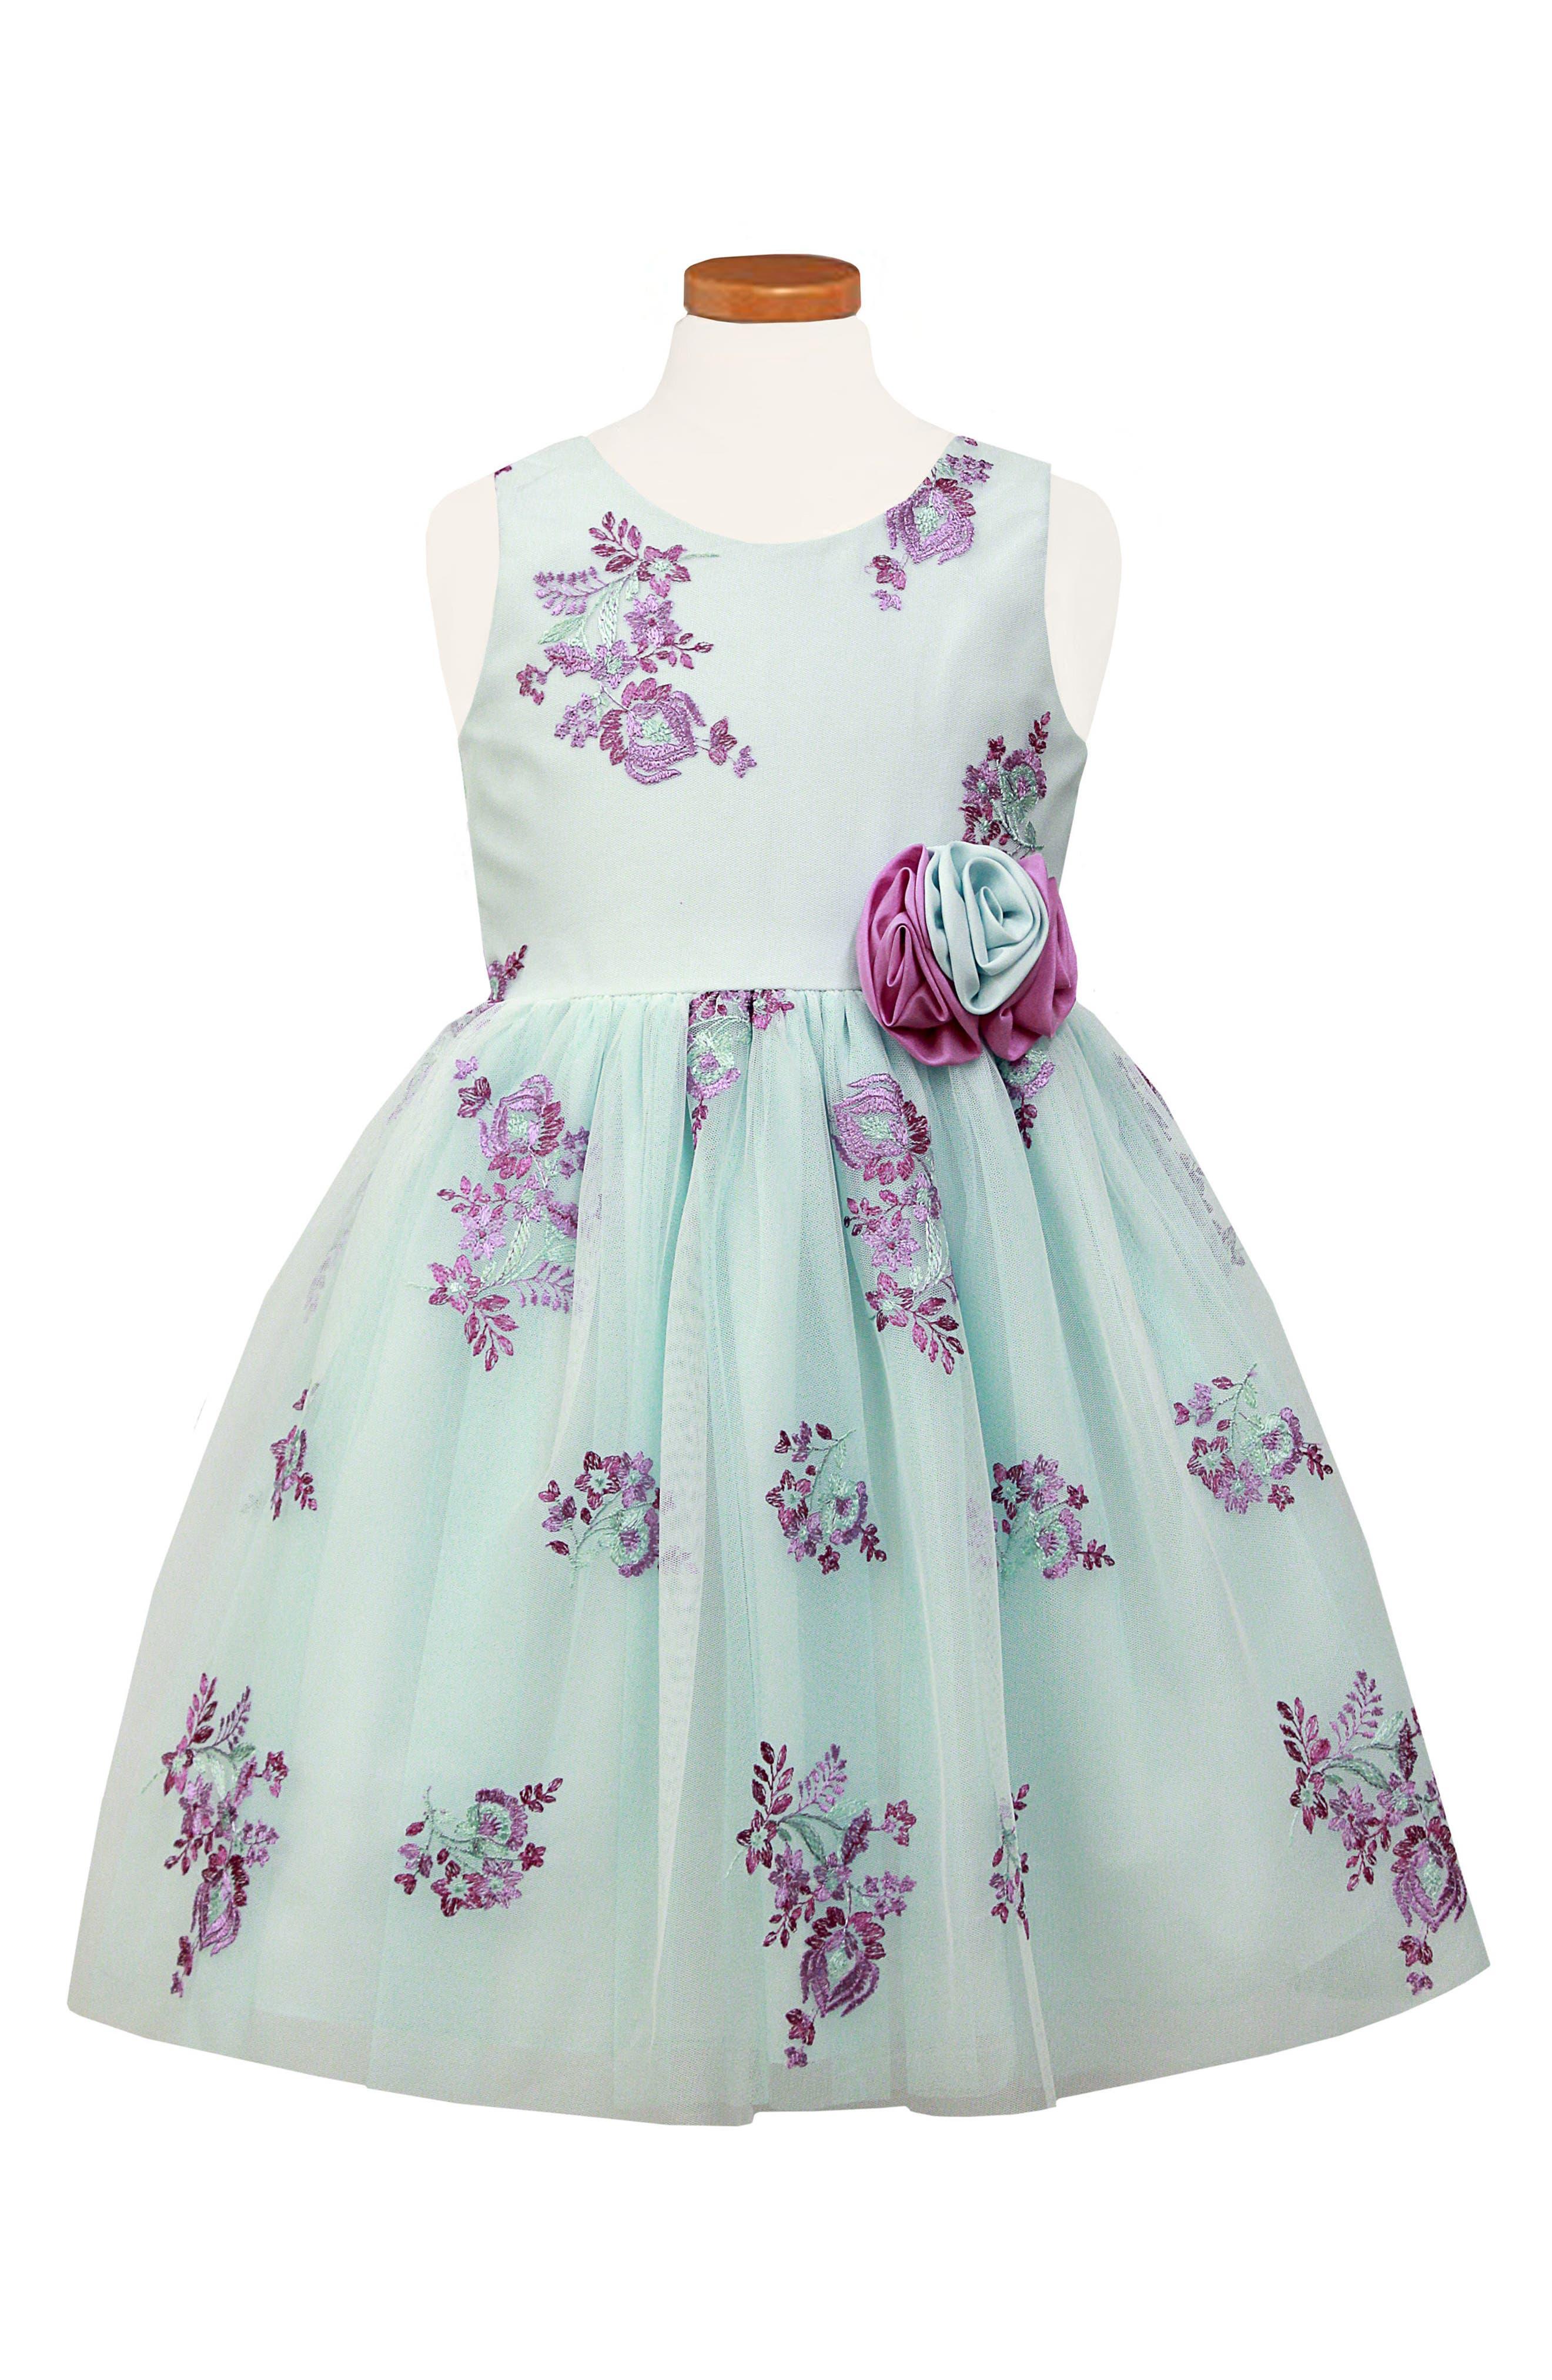 Main Image - Sorbet Embroidered Floral Tulle Dress (Toddler Girls & Little Girls)